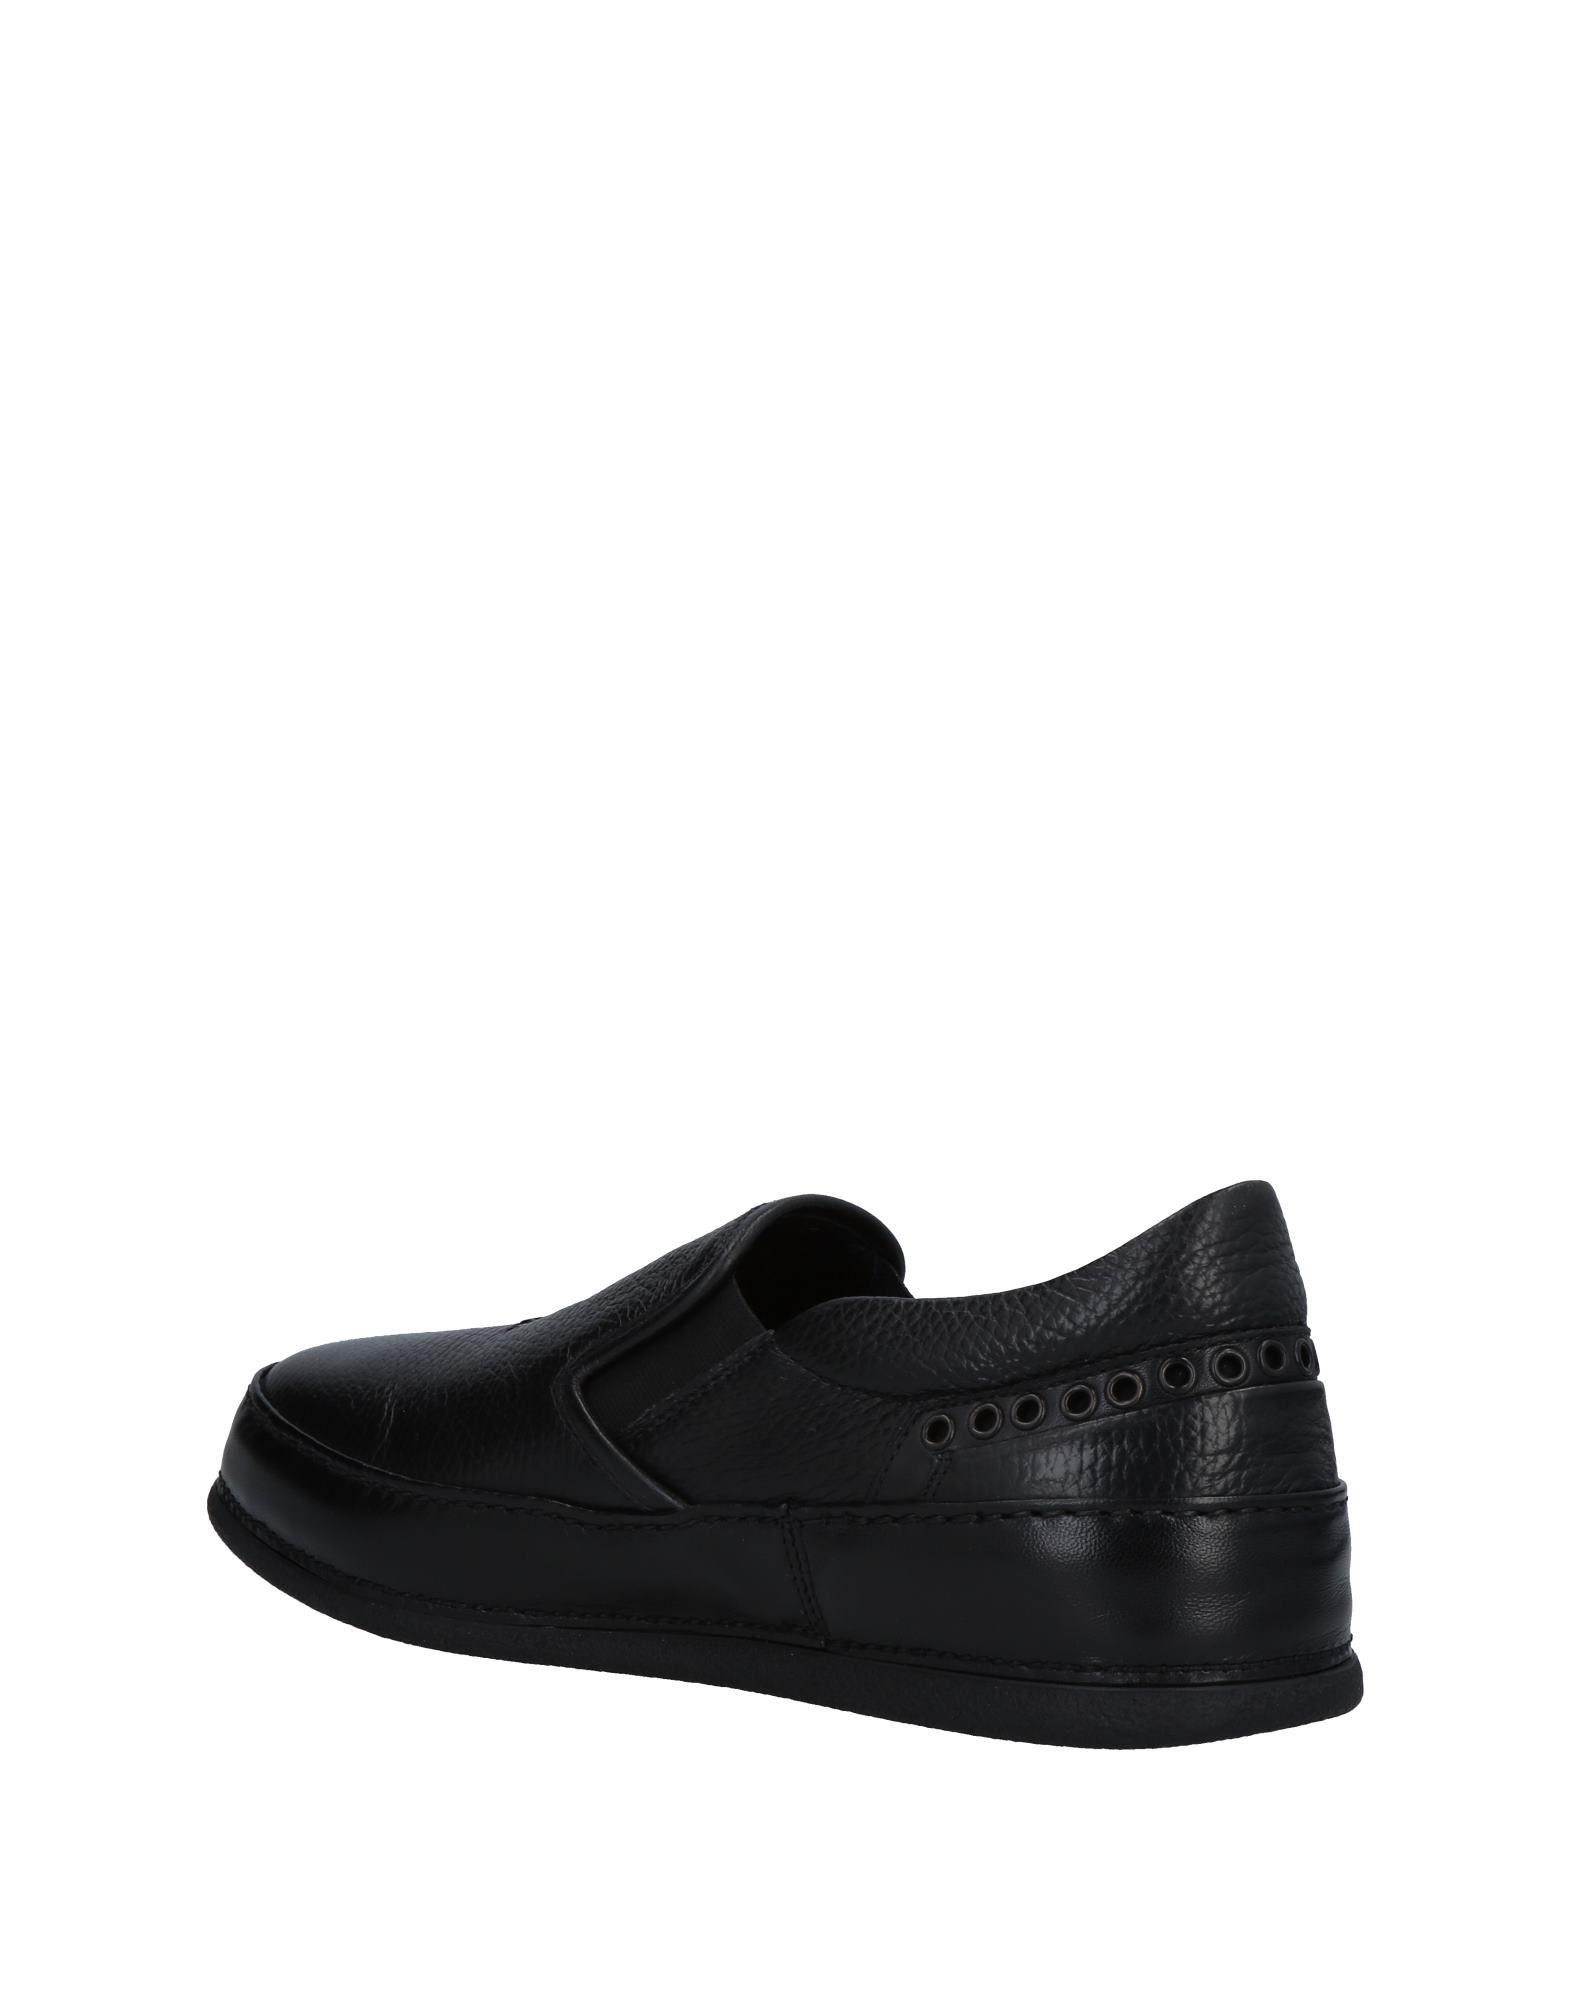 Sneakers Bruno Bruno Sneakers Bordese Uomo - 11482433IB e657f0